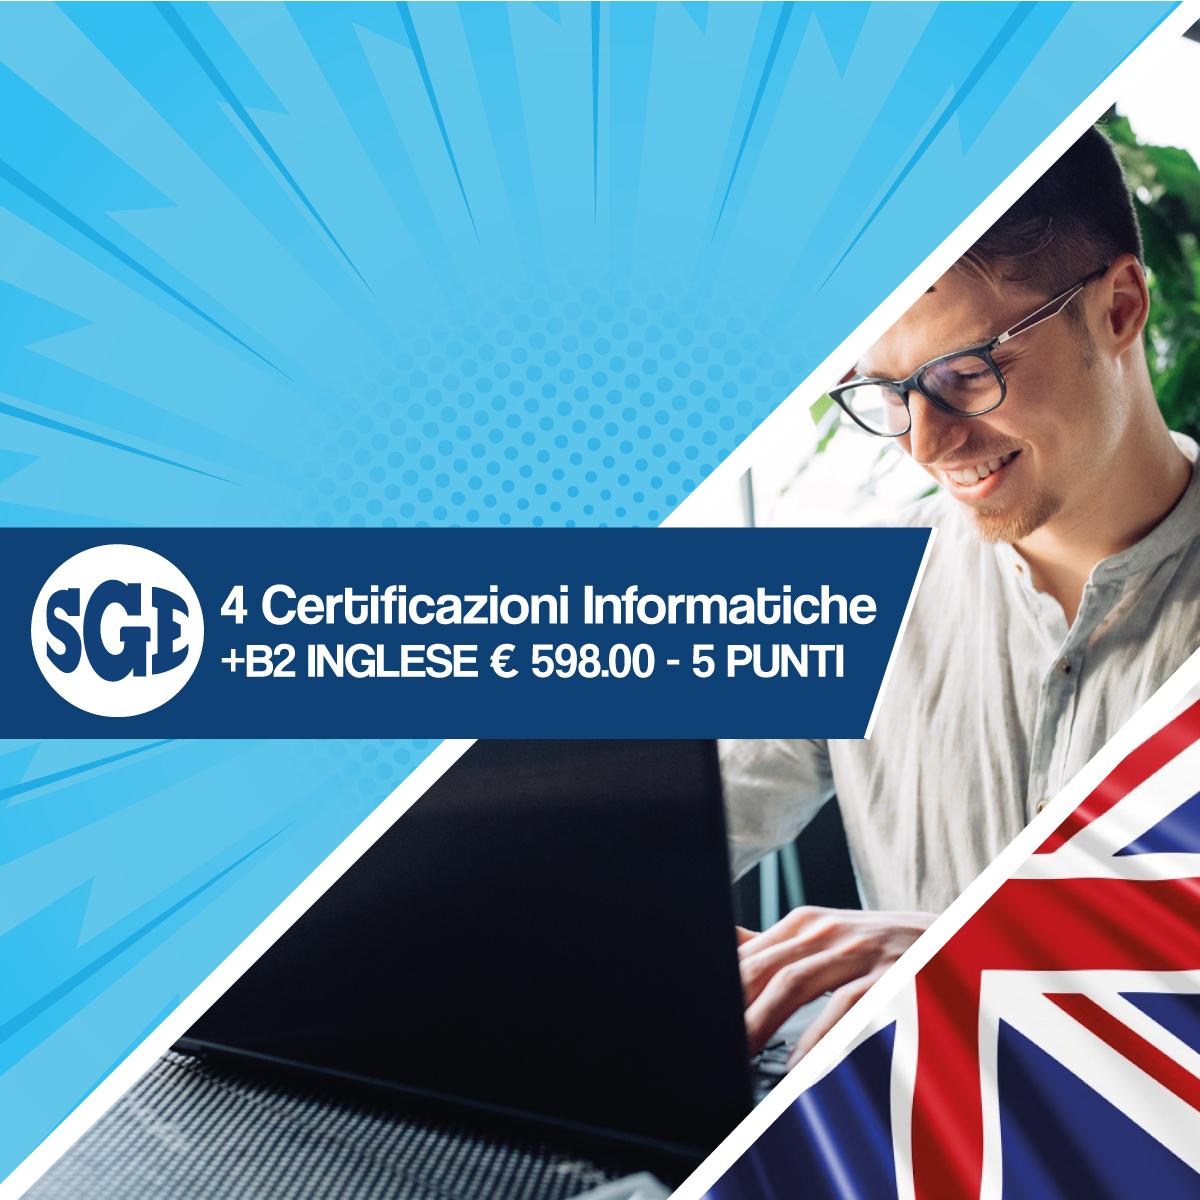 4 Certificazioni Informatiche +B2 INGLESE €598.00 - 5 PUNTI